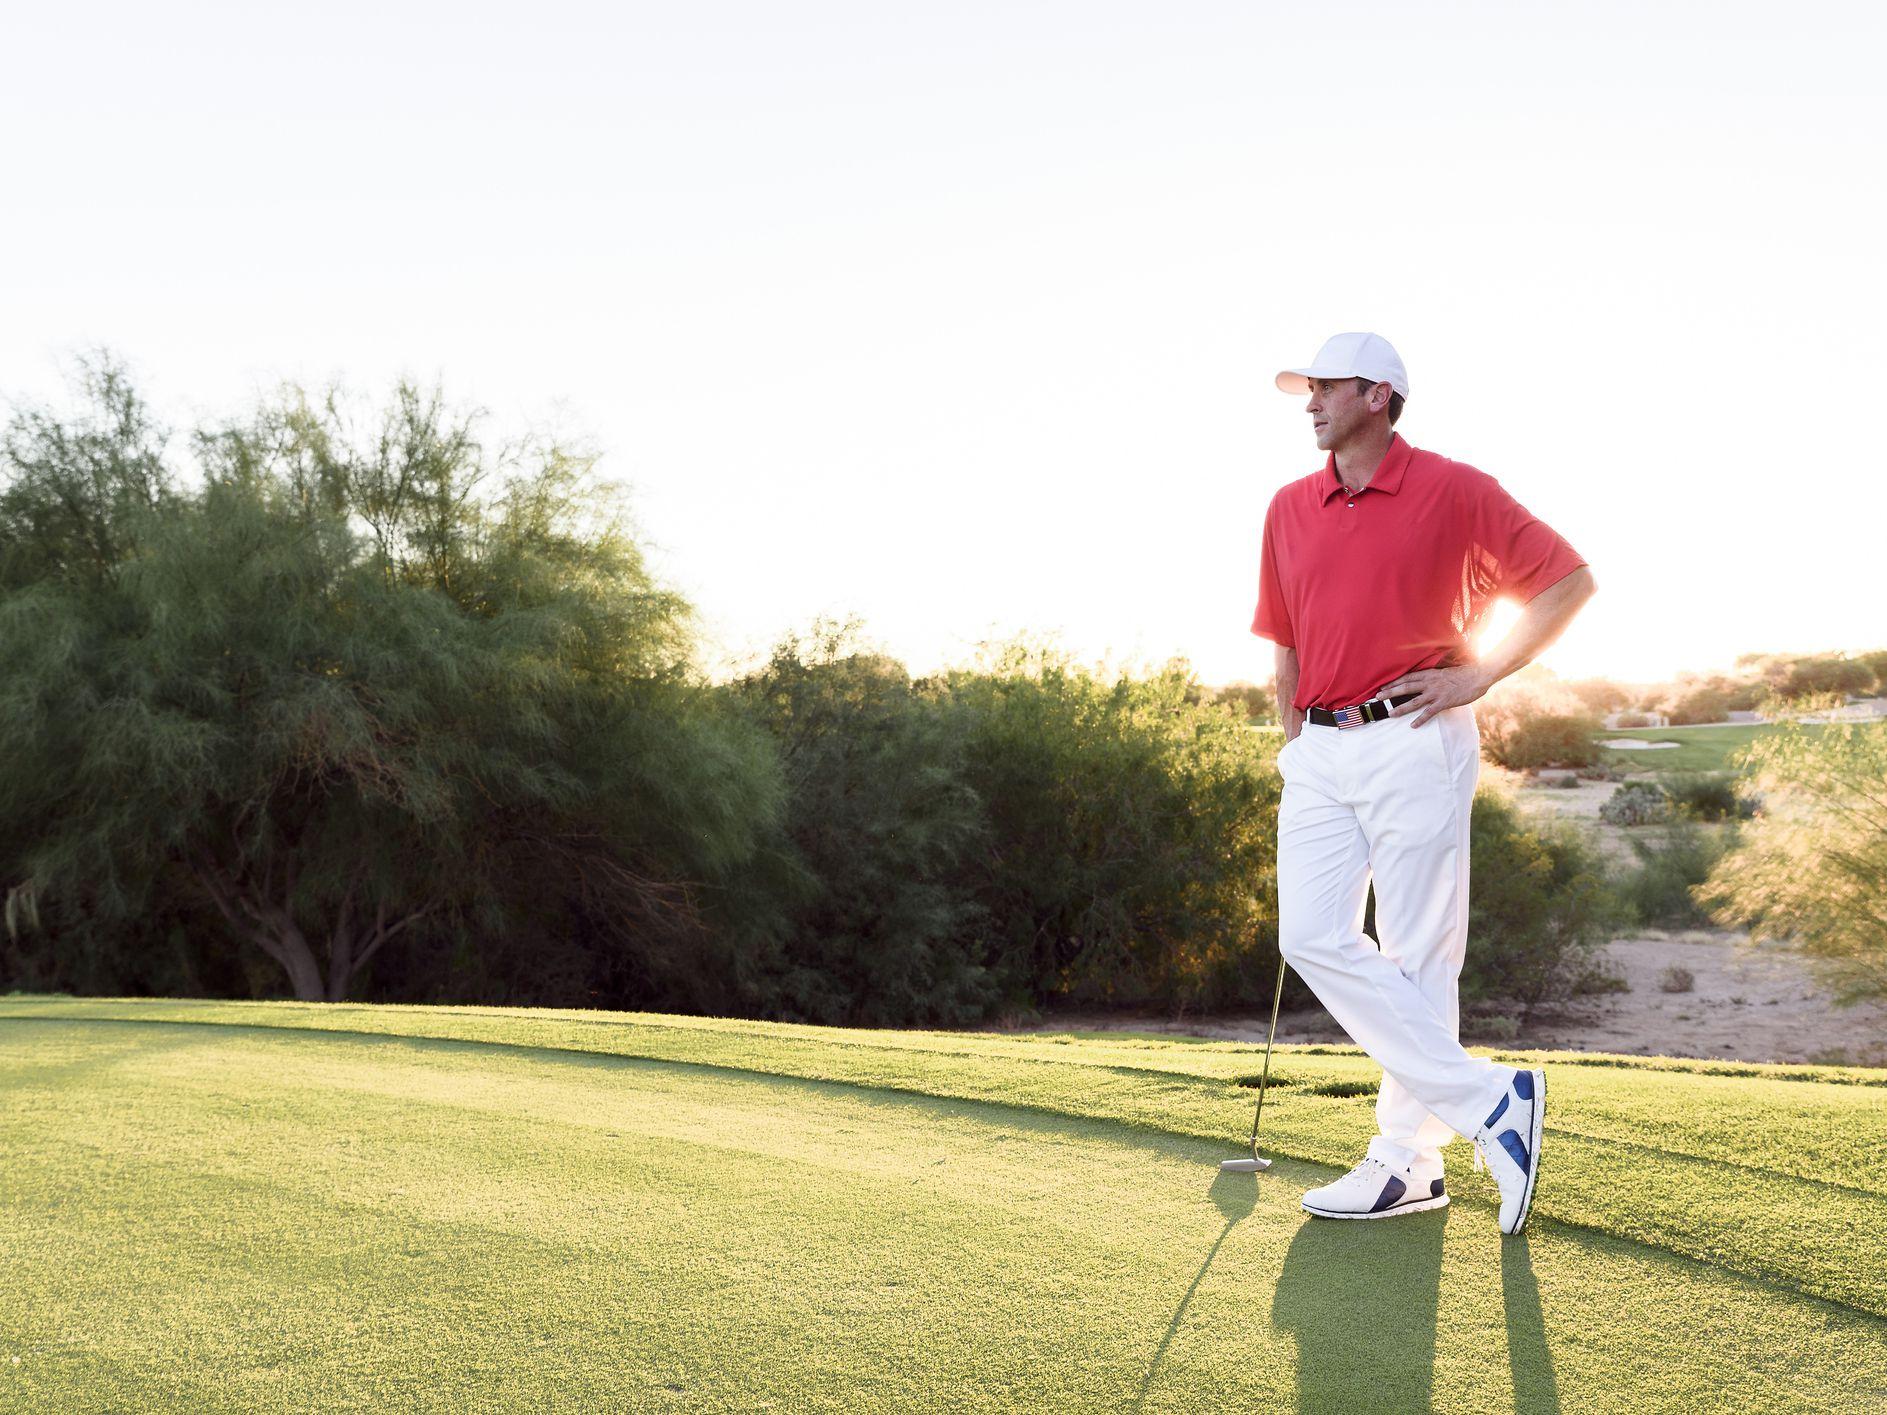 The 8 Best Golf Analyzers of 2019